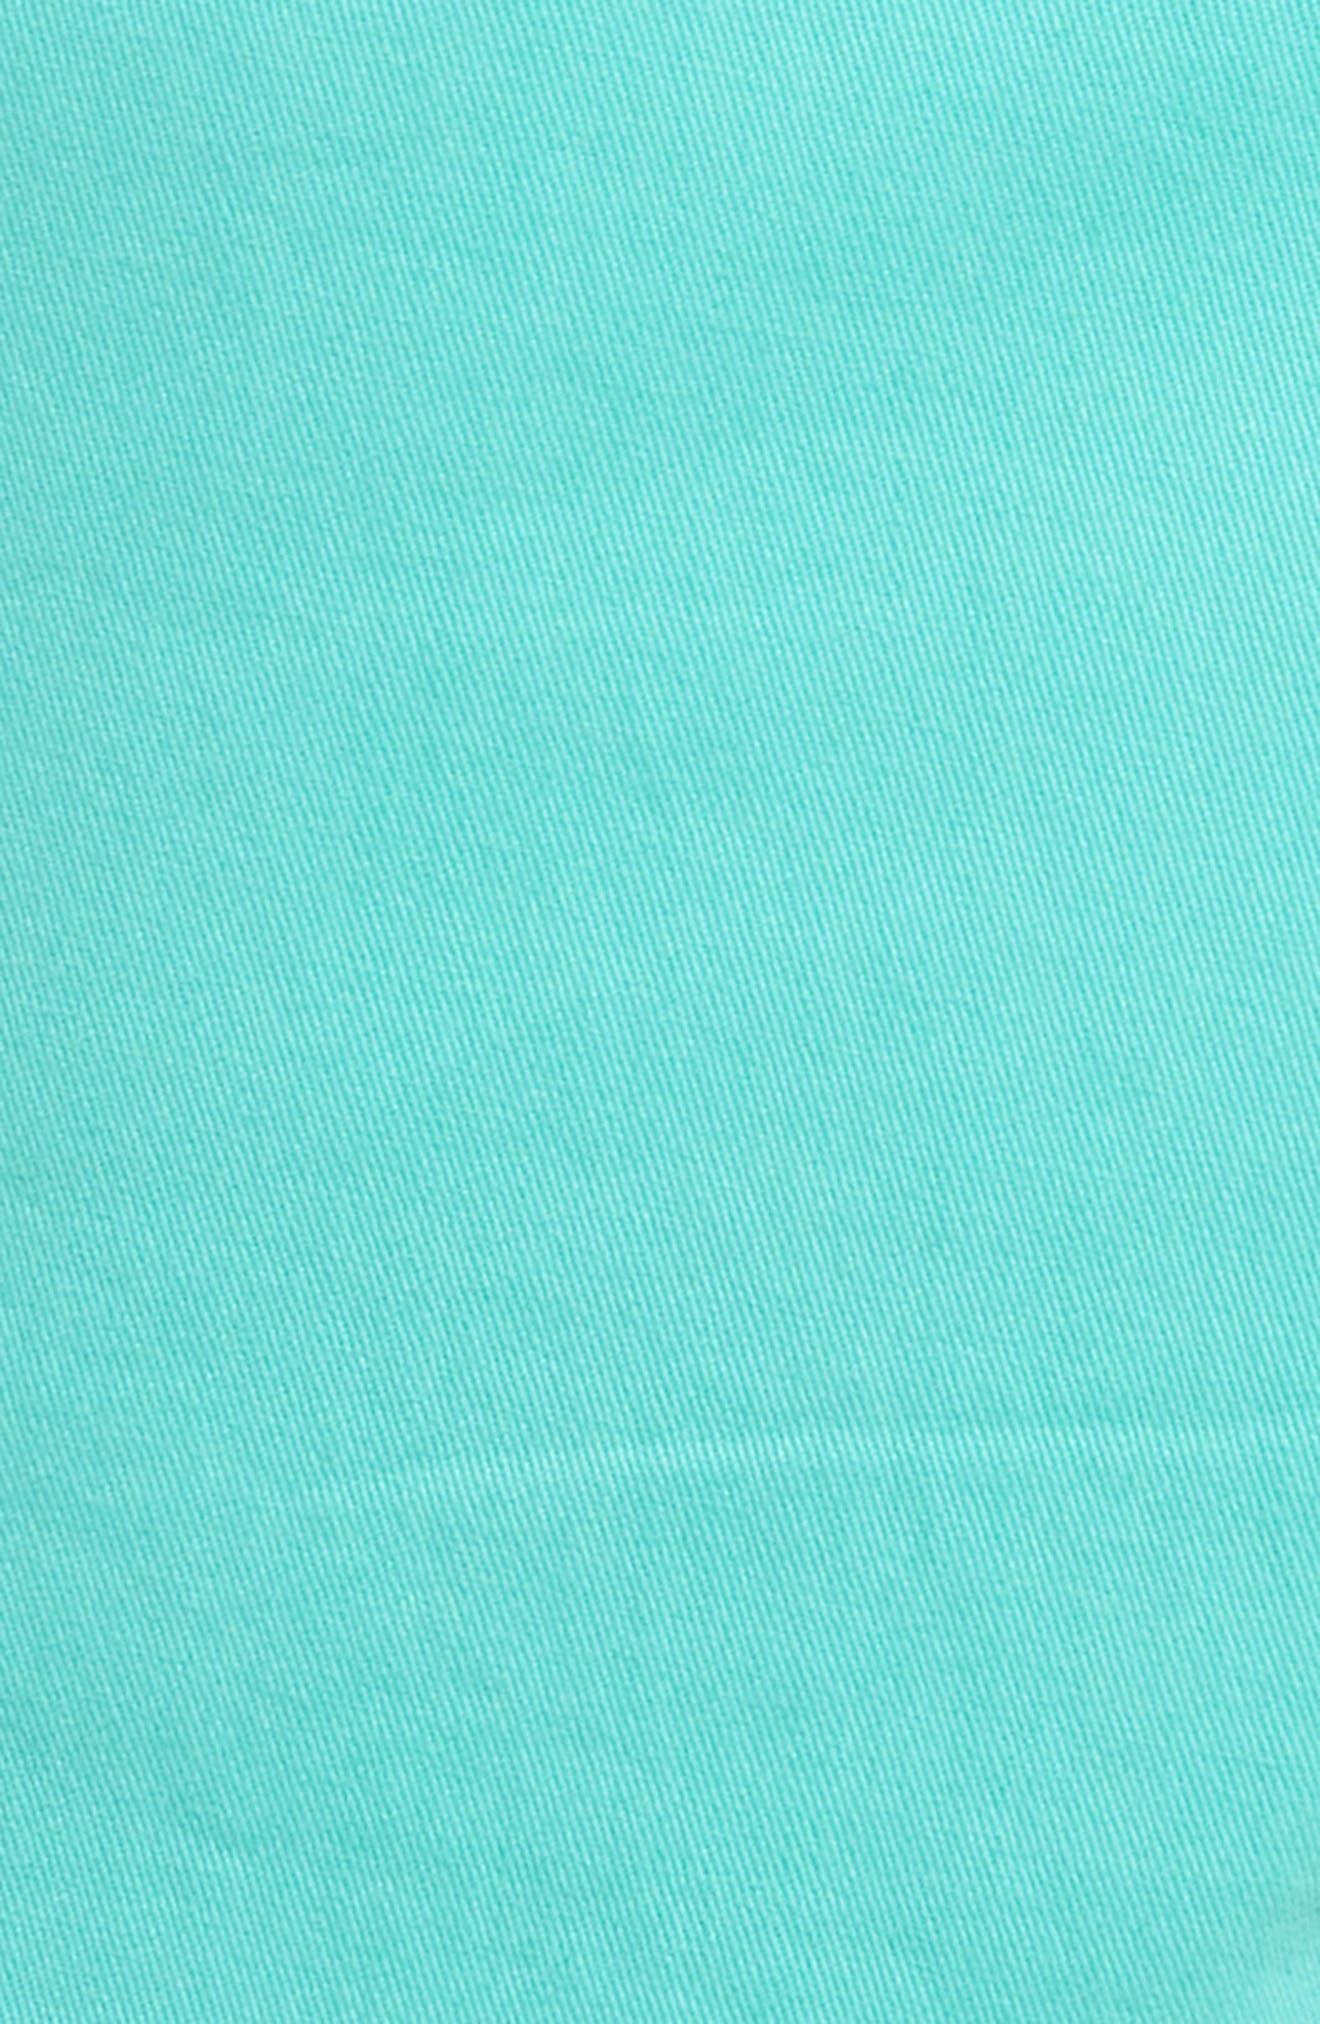 Ballard Slim Fit Stretch Chino 9-Inch Shorts,                             Alternate thumbnail 5, color,                             Green Largo